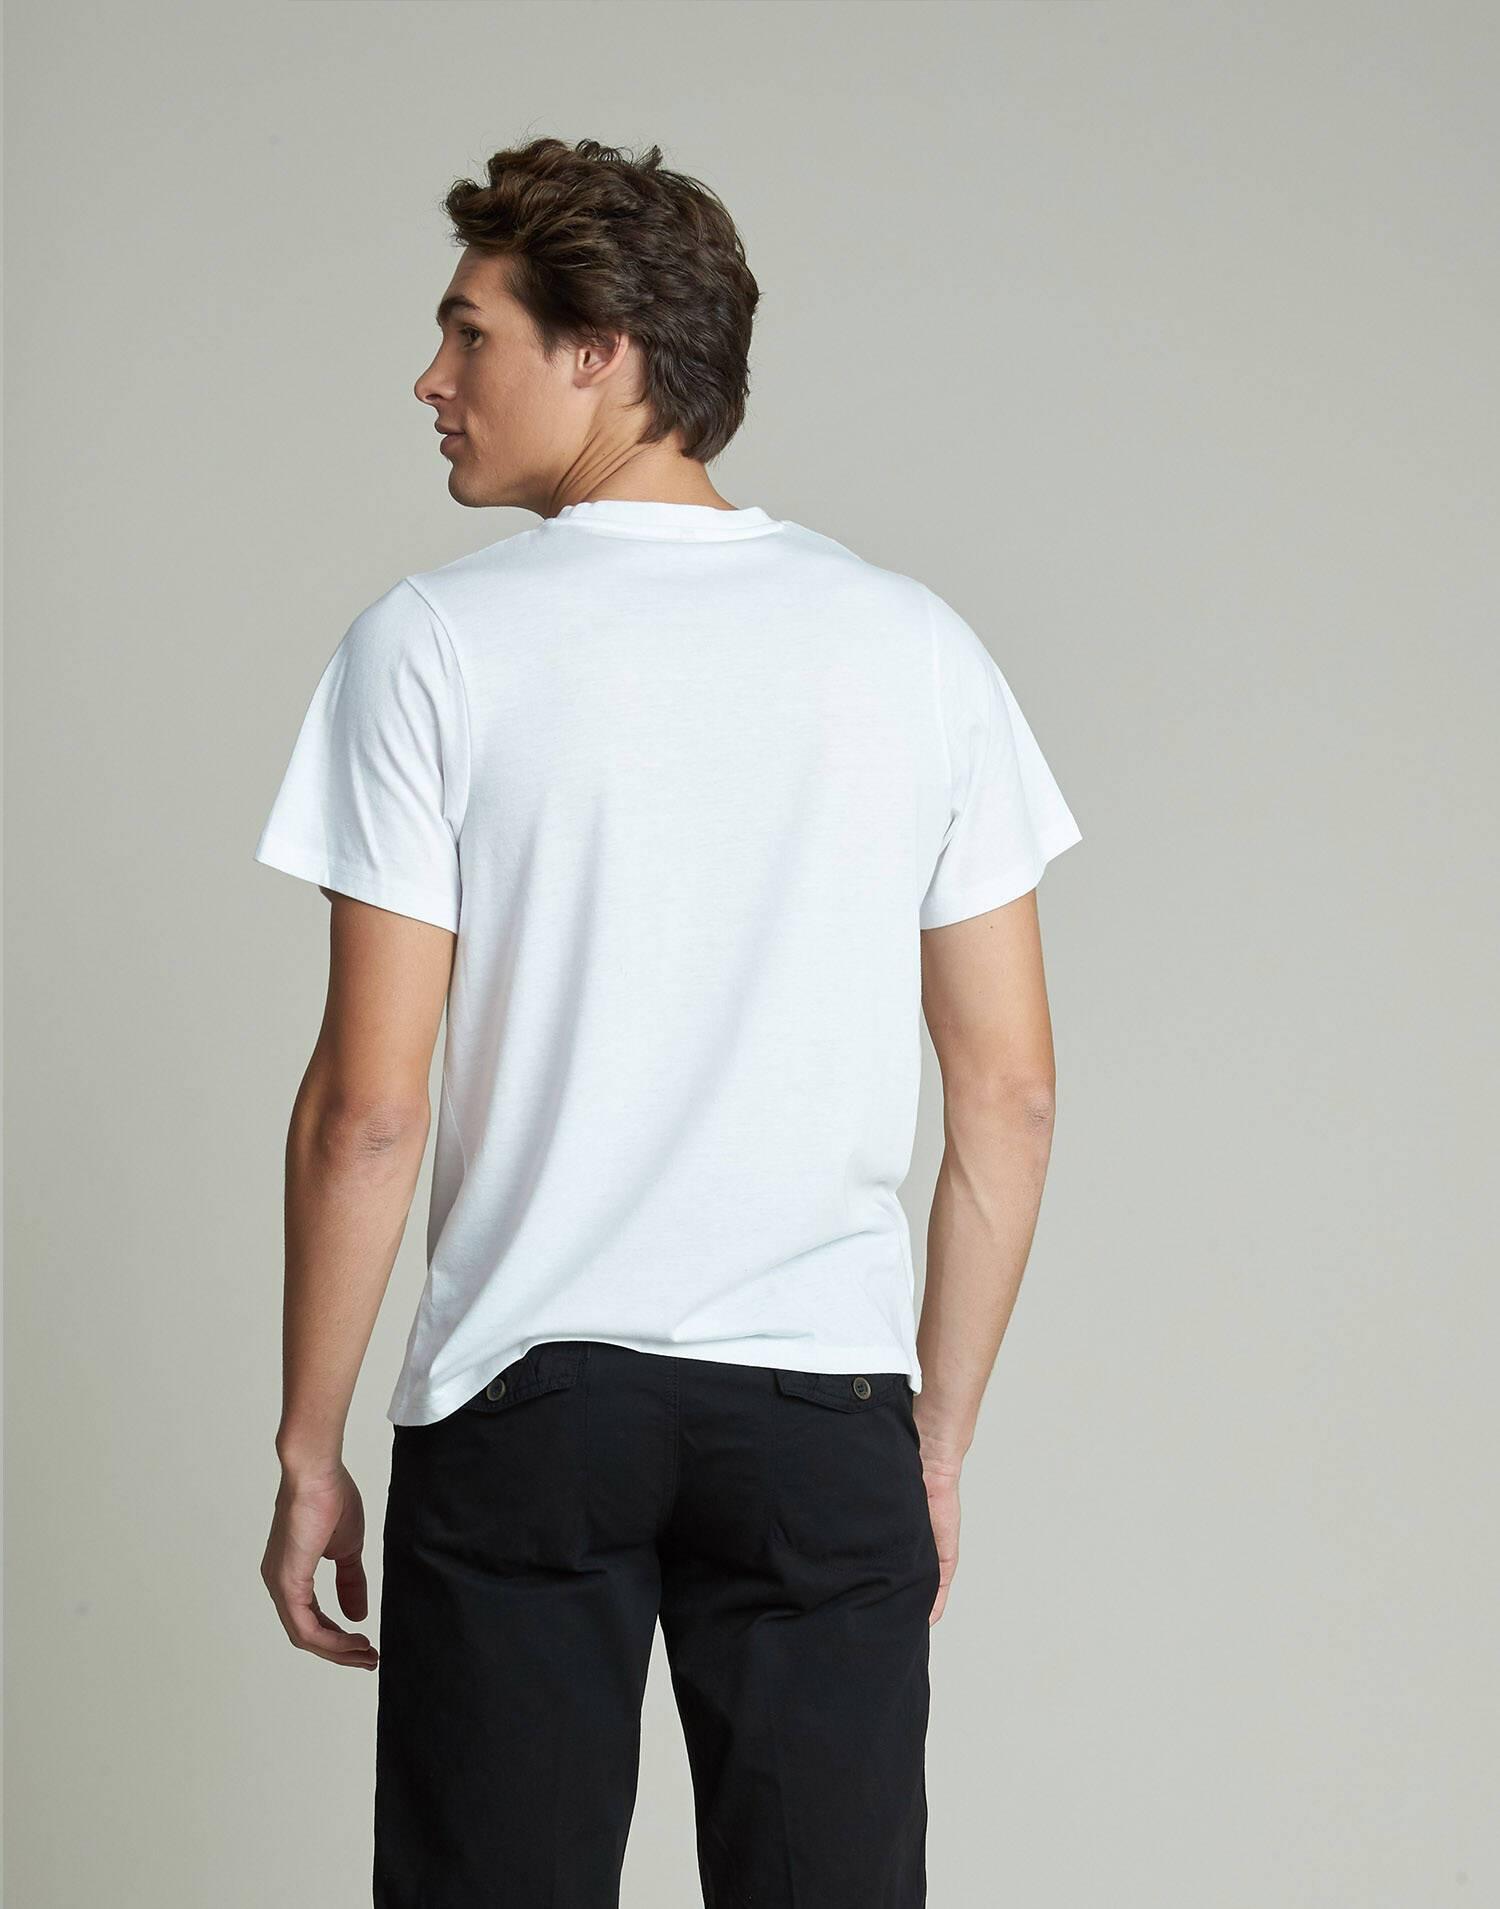 Waikiki men's t-shirt